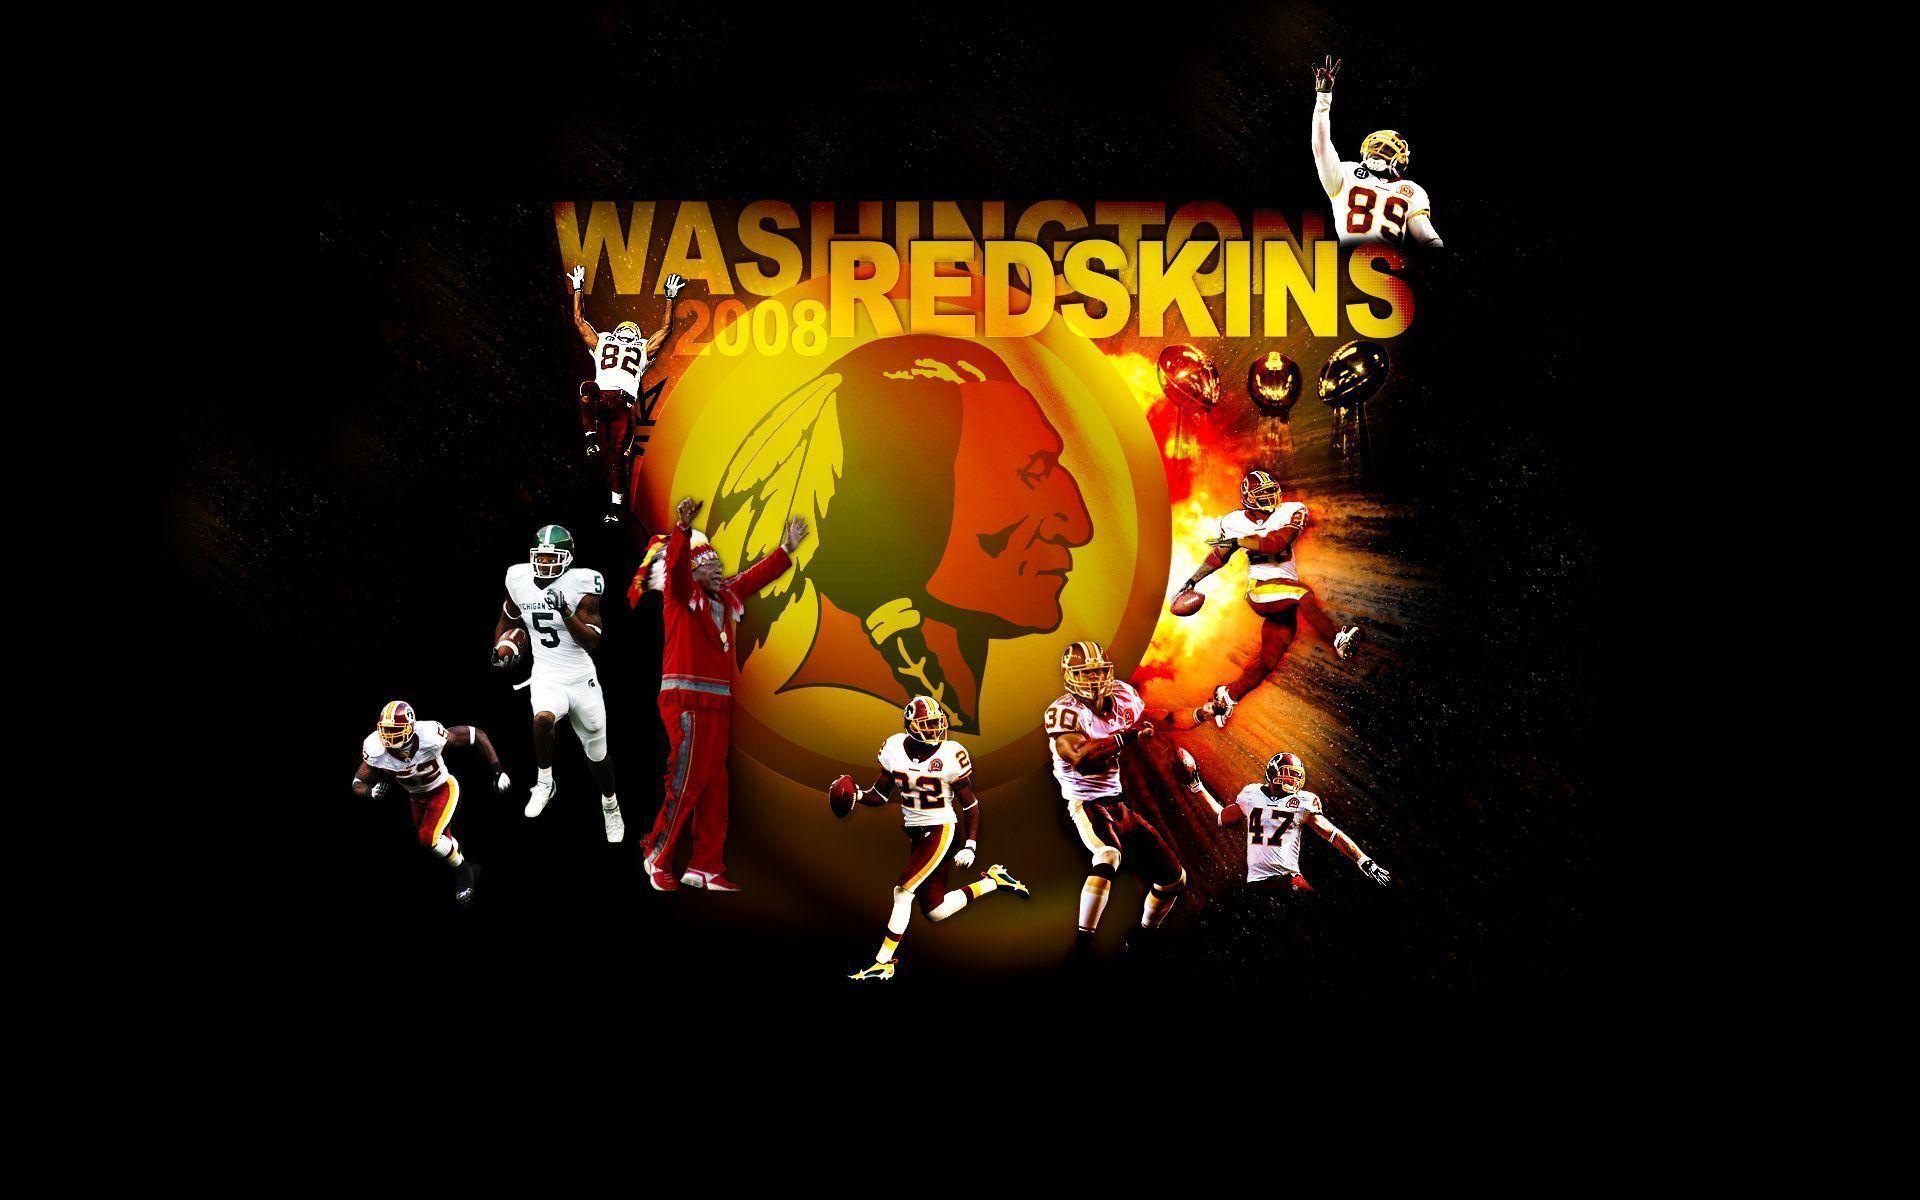 Redskins wallpapers 2015 wallpaper cave - Redskins wallpaper phone ...